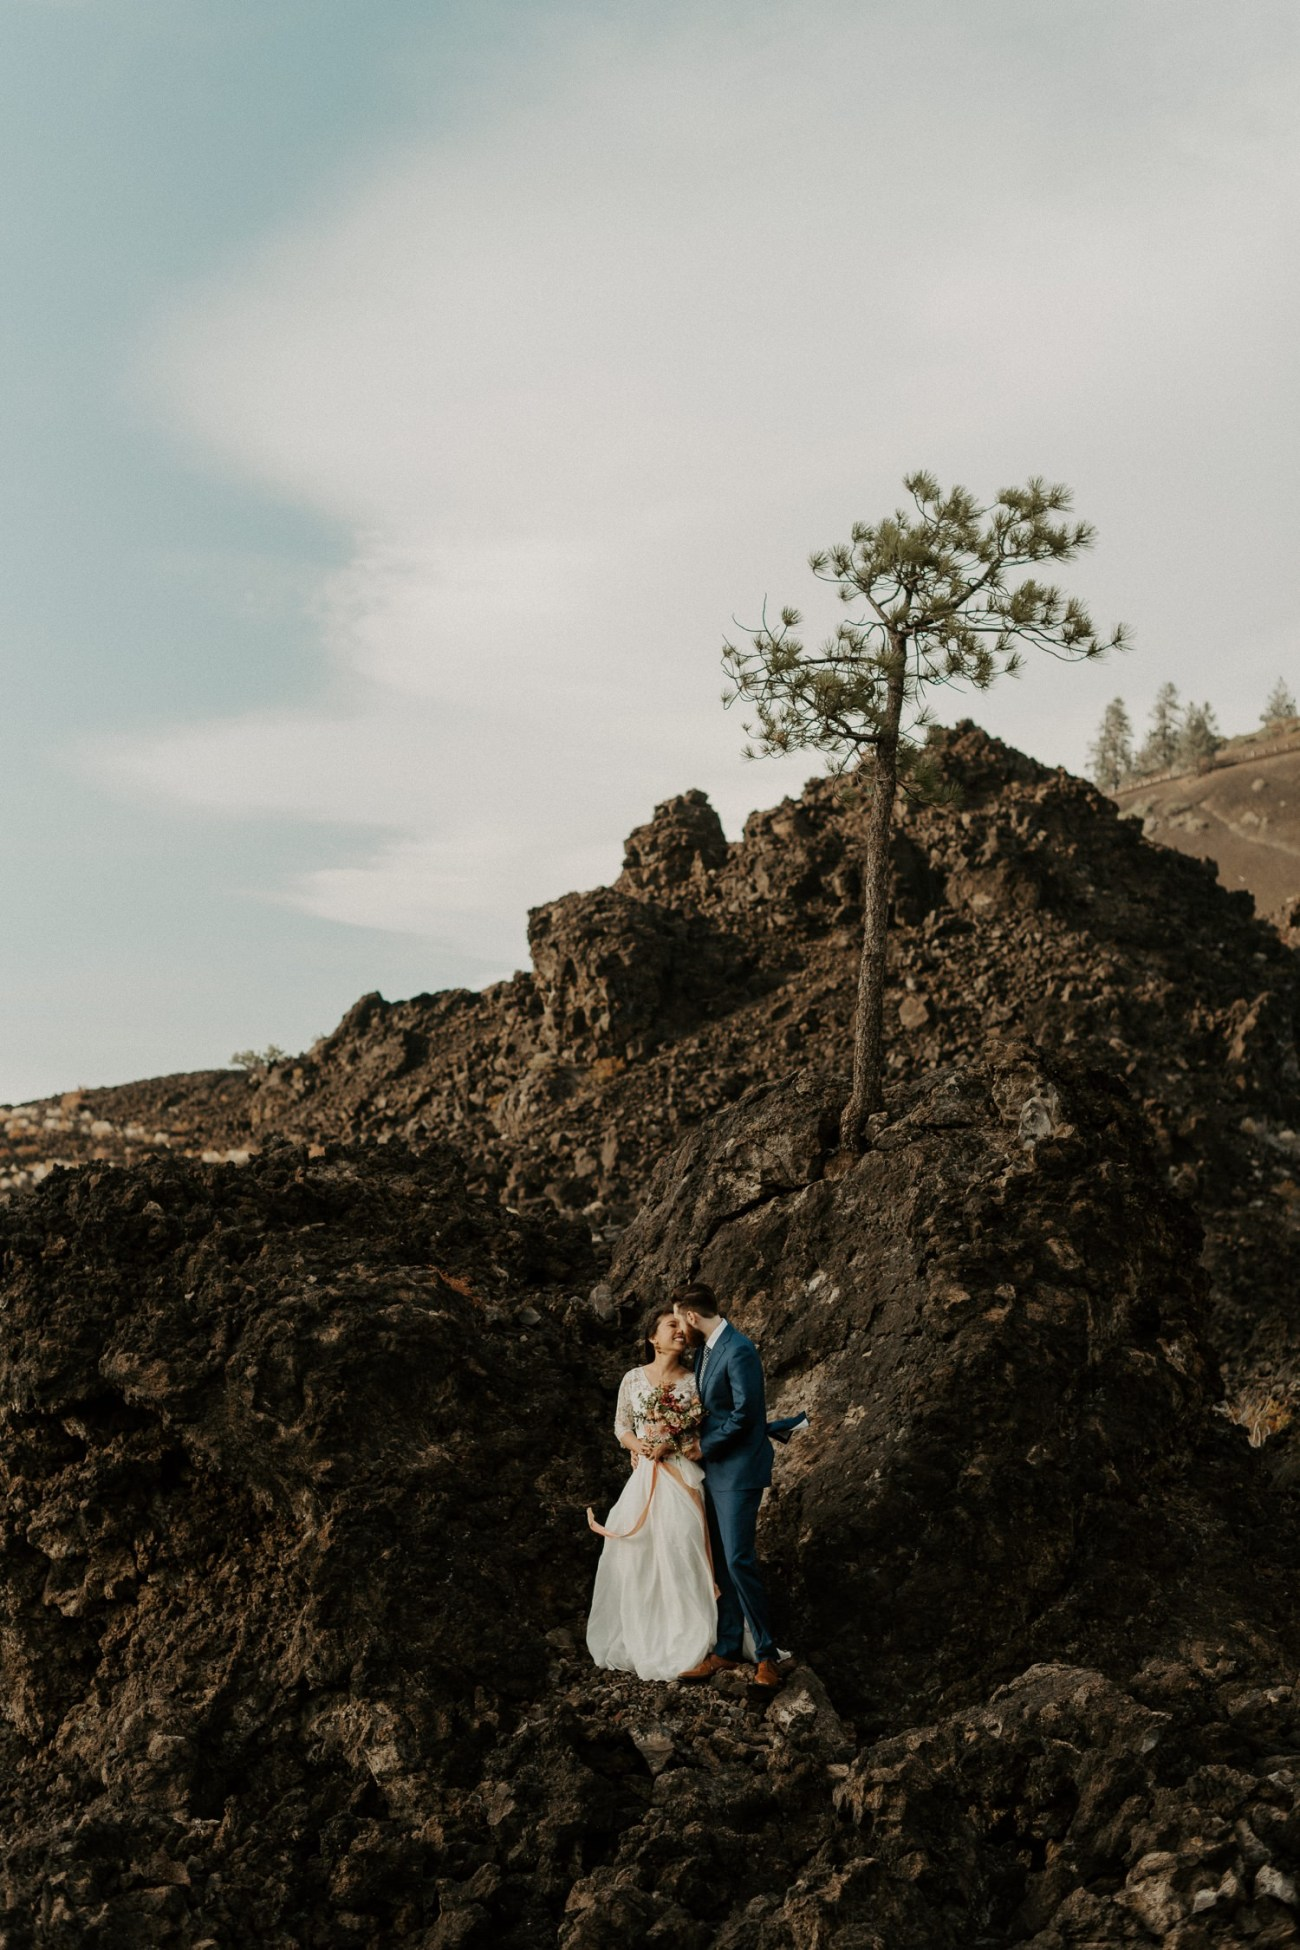 Newberry Volcano Elopement Bend Elopement Bridal Session Bend Wedding Photographer Anais Possamai Photography 024